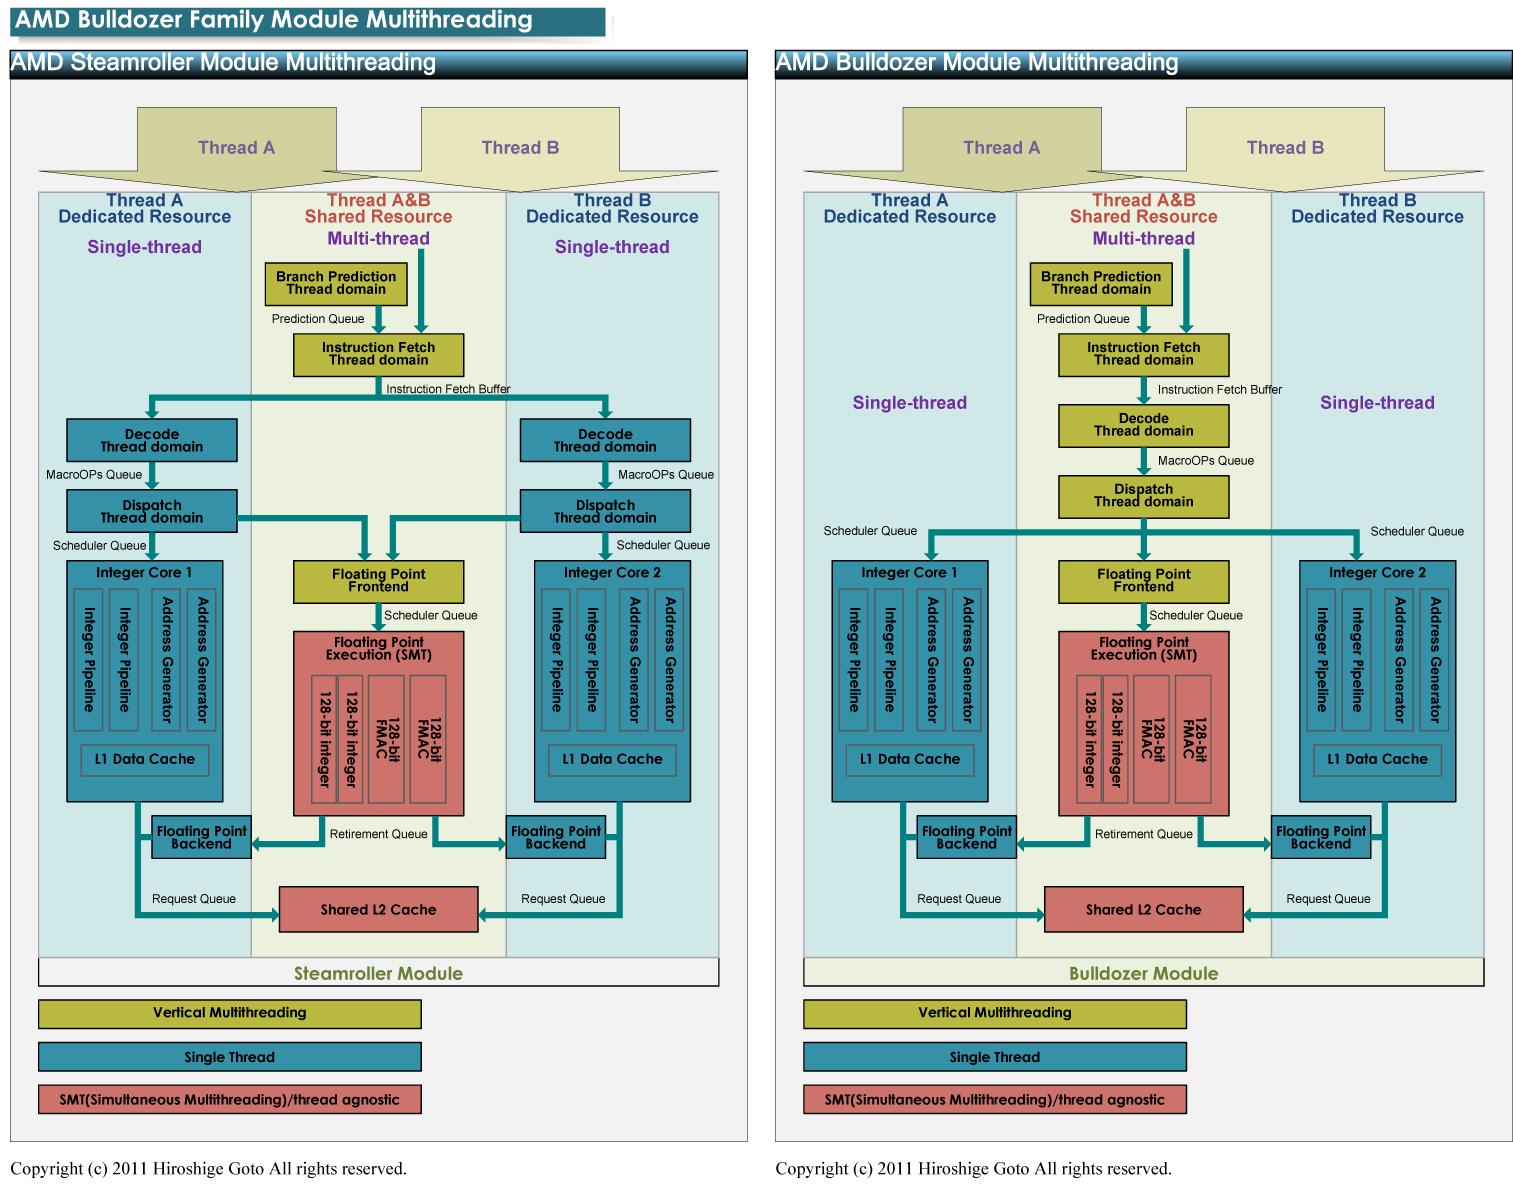 "BulldozerとSteamrollerのマルチスレッディングの違い<br class="""">PDF版は<span class=""img-inline raw""><a href=""/video/pcw/docs/606/220/p6.pdf"" ipw_status=""1"" ipw_linktype=""filelink_raw"" class=""resource"">こちら</a></span>"